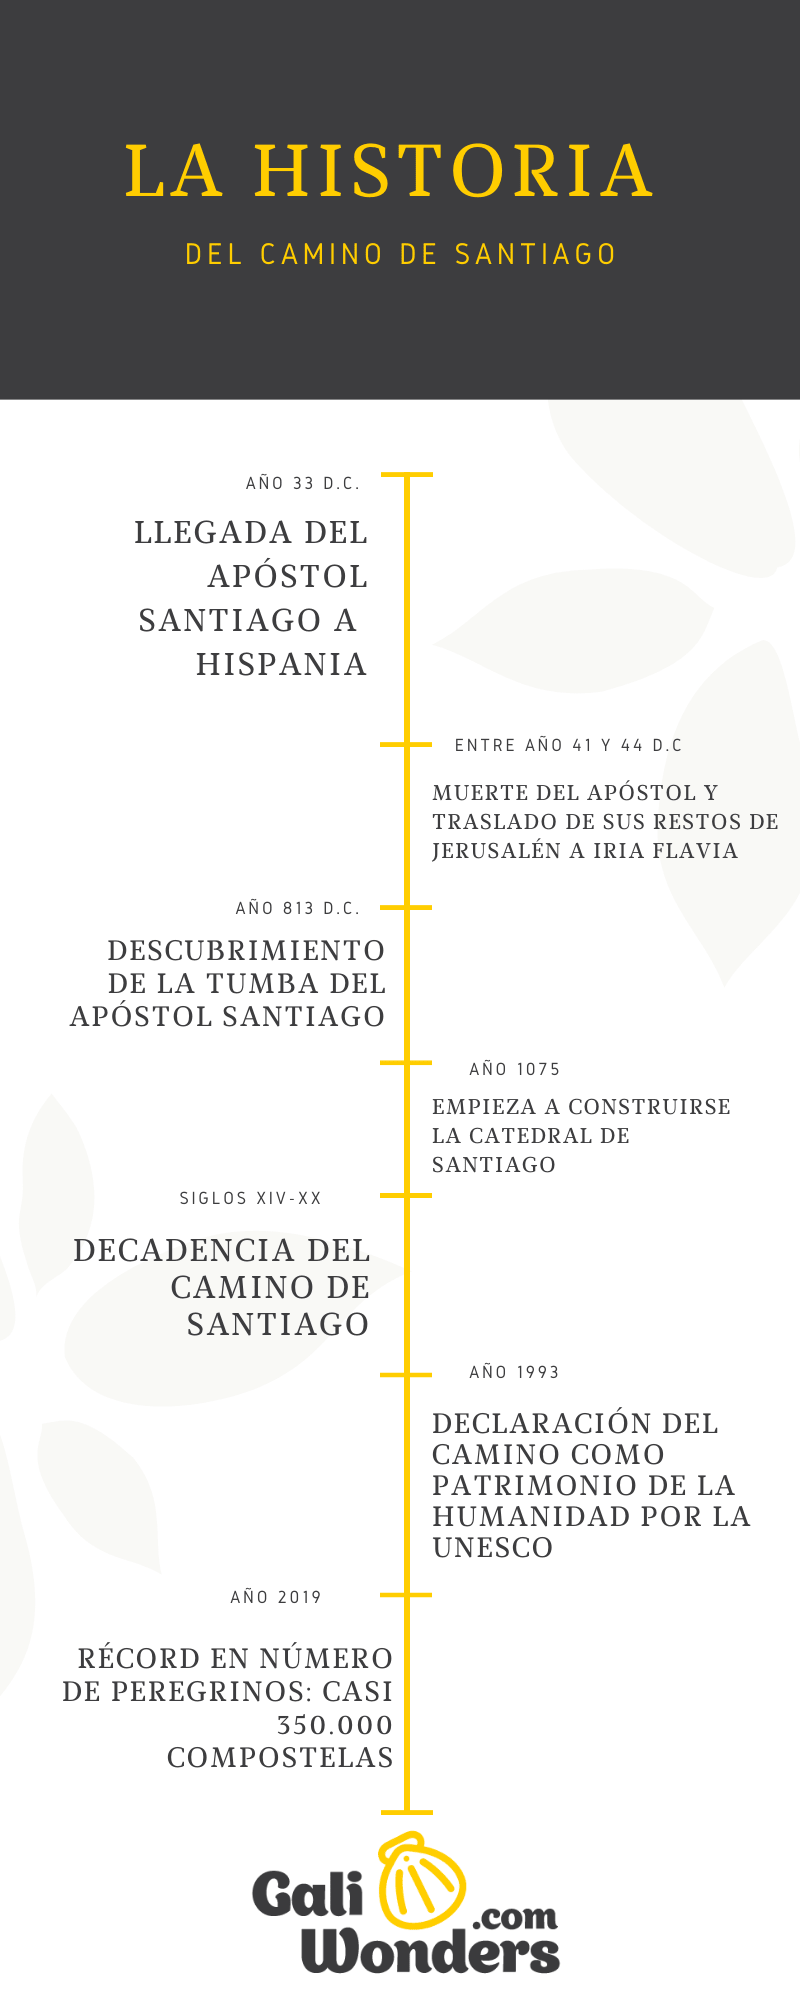 La historia del Camino de santiago infografia galiwonders